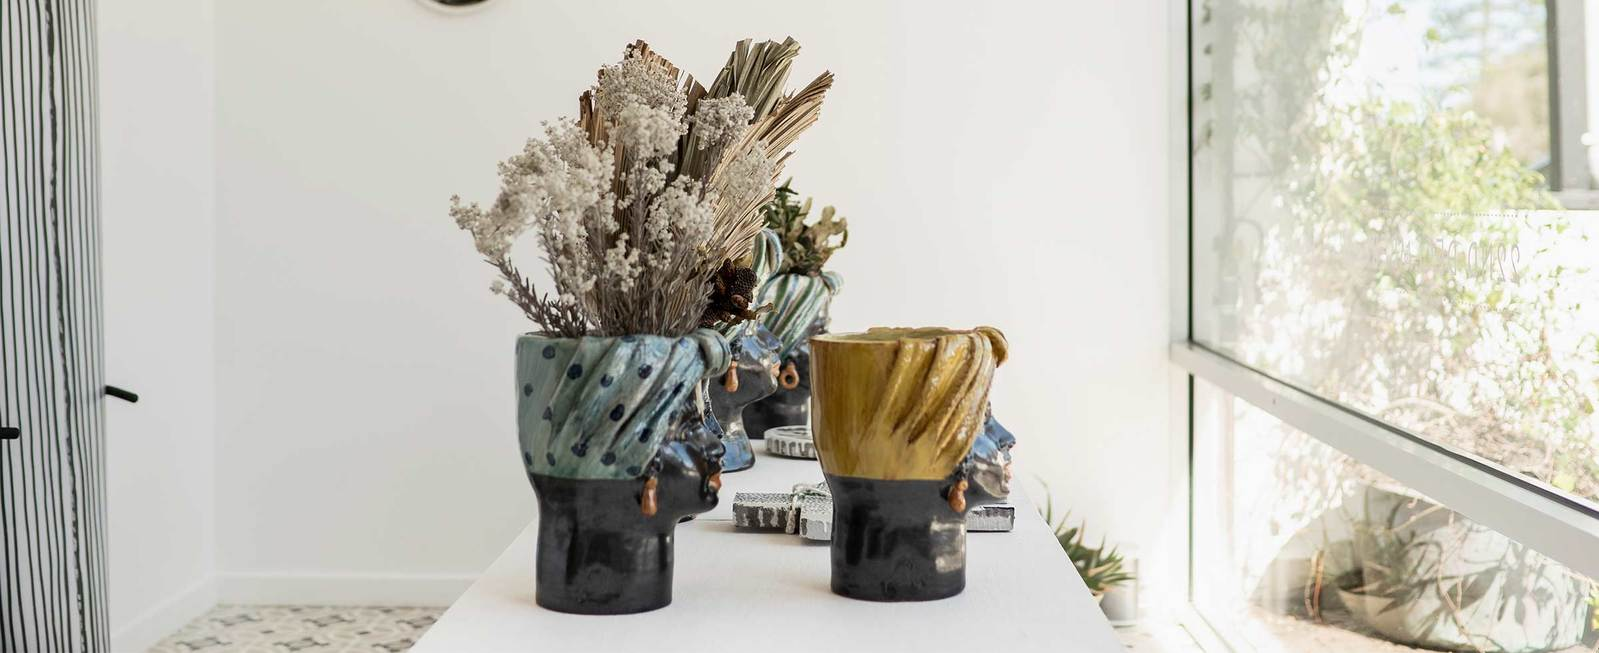 https://storage.googleapis.com/dtk-fenton-fenton/page/Sicilian-Alessi-vases-by_fenton-and-fenton_1600x_1553485521969.jpg